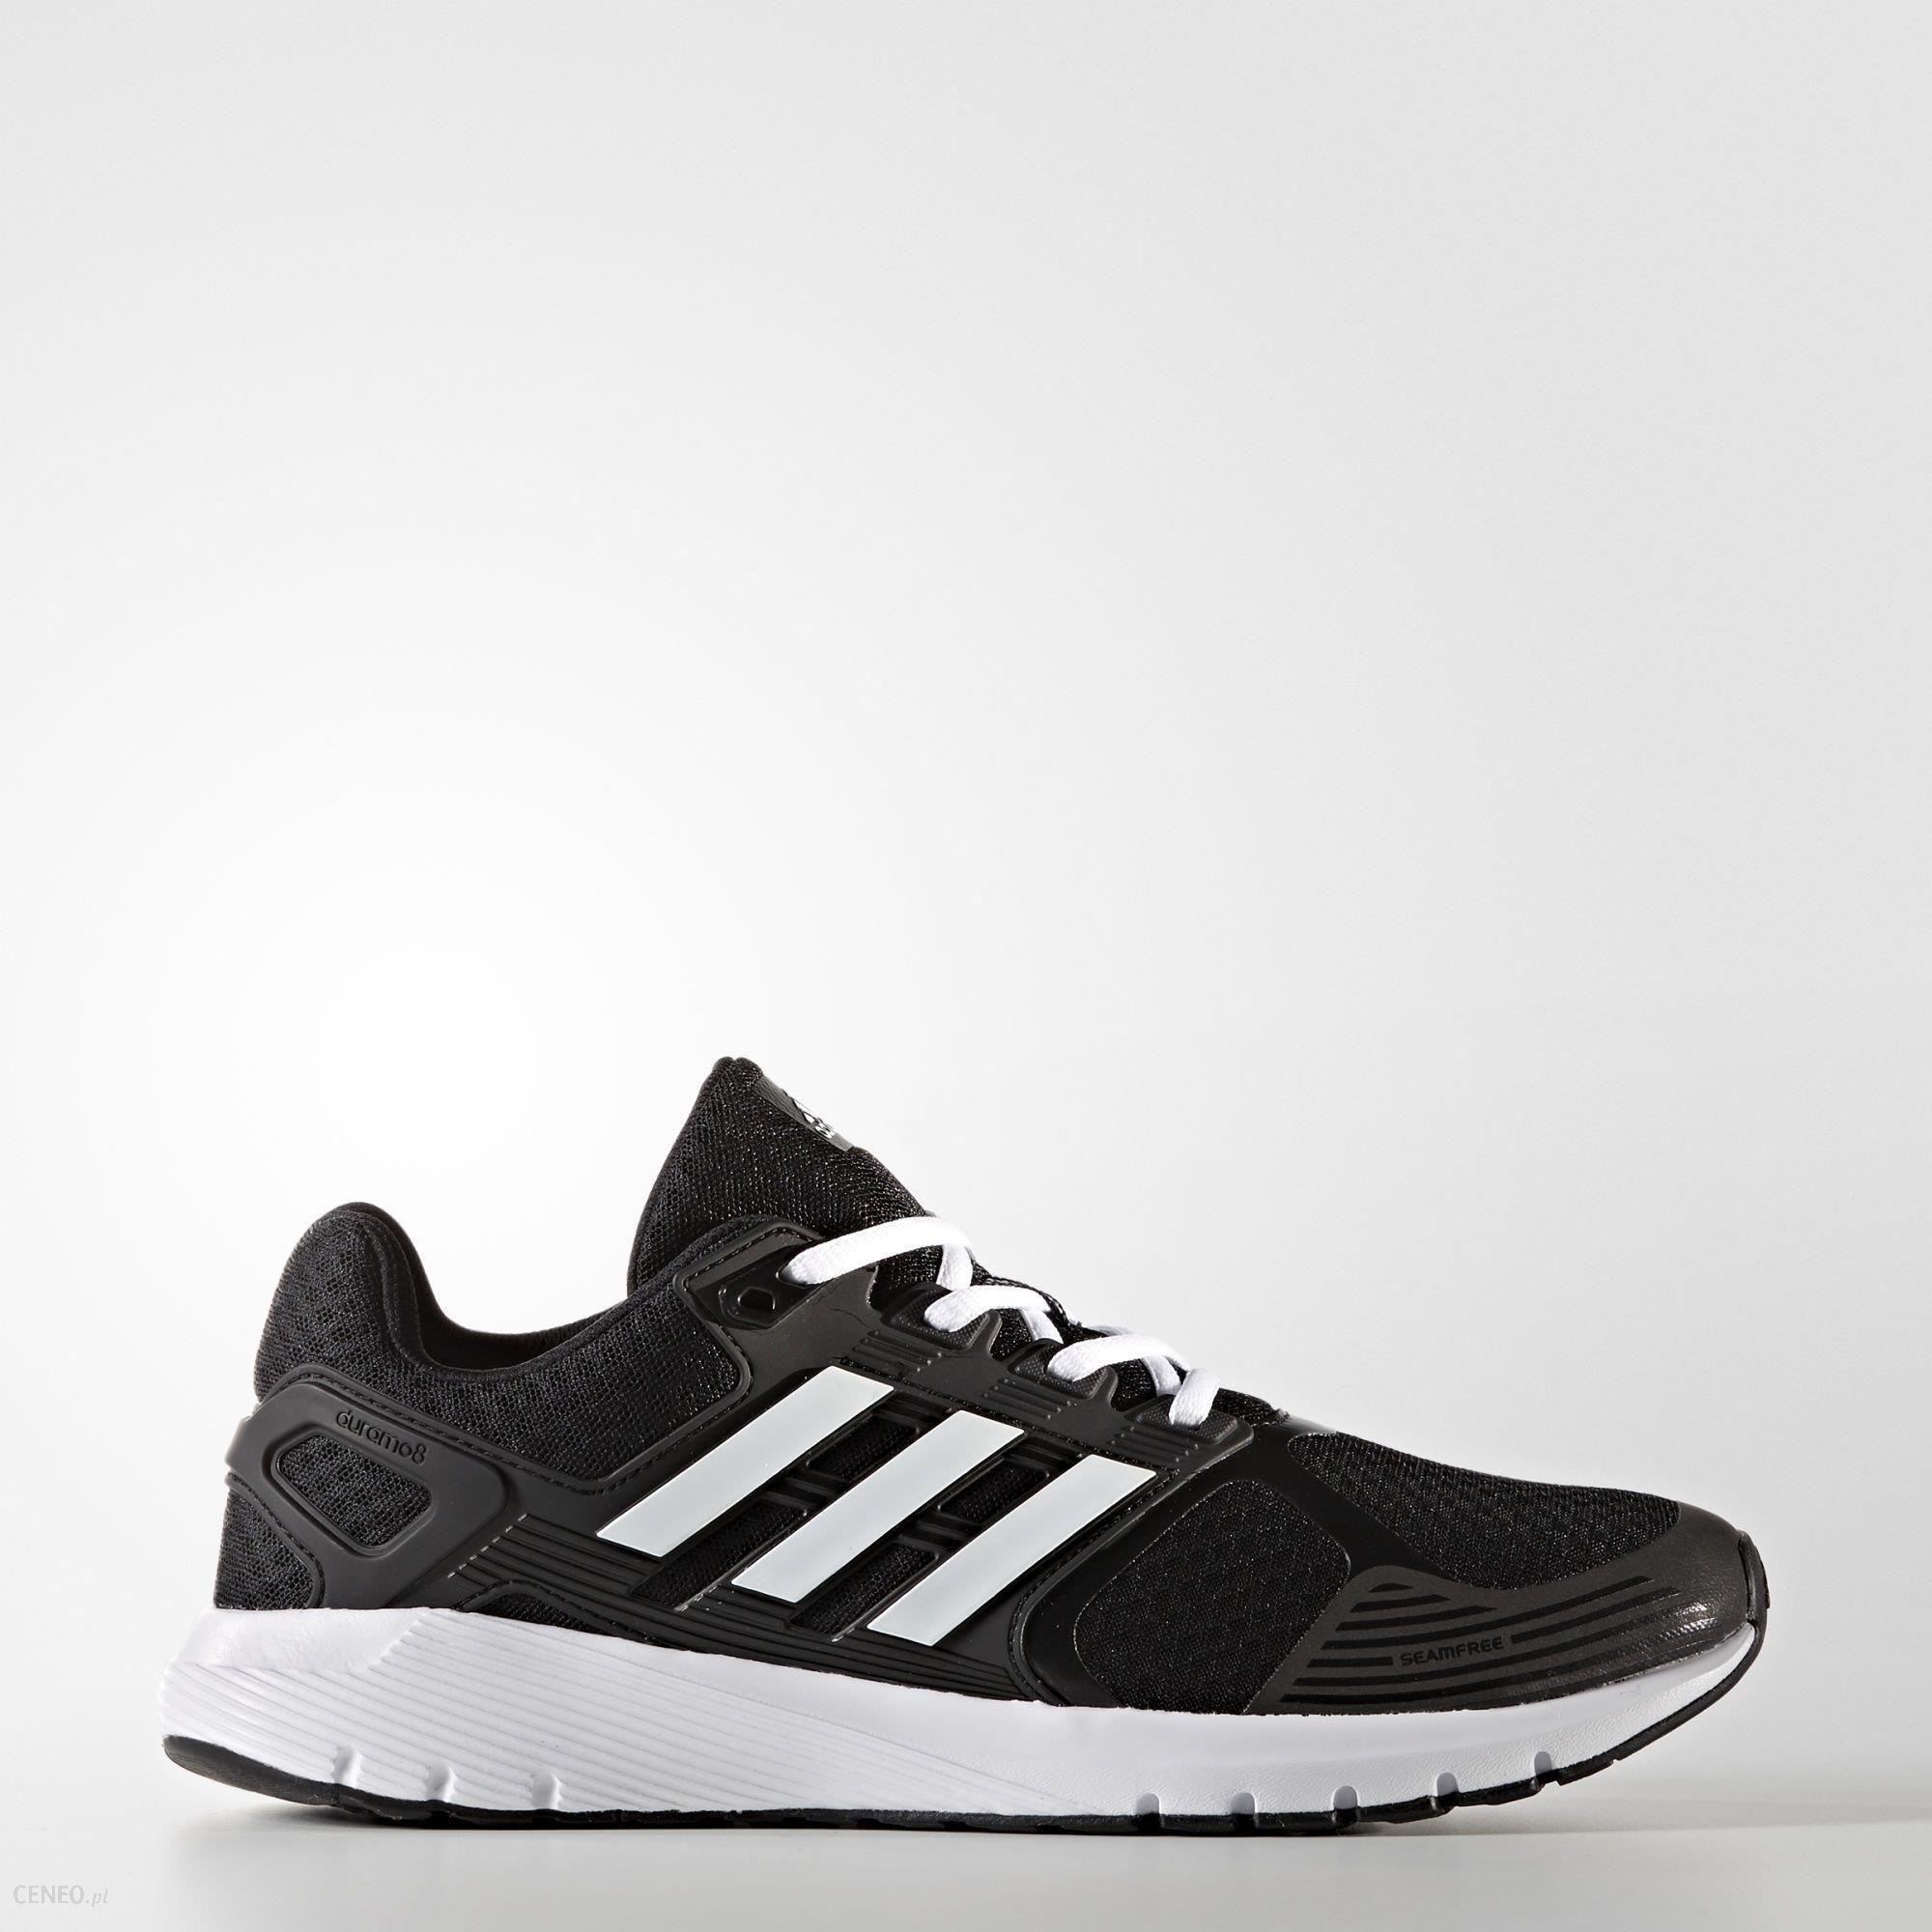 Buty do biegania Adidas Duramo 8 Ba8078 Czarne